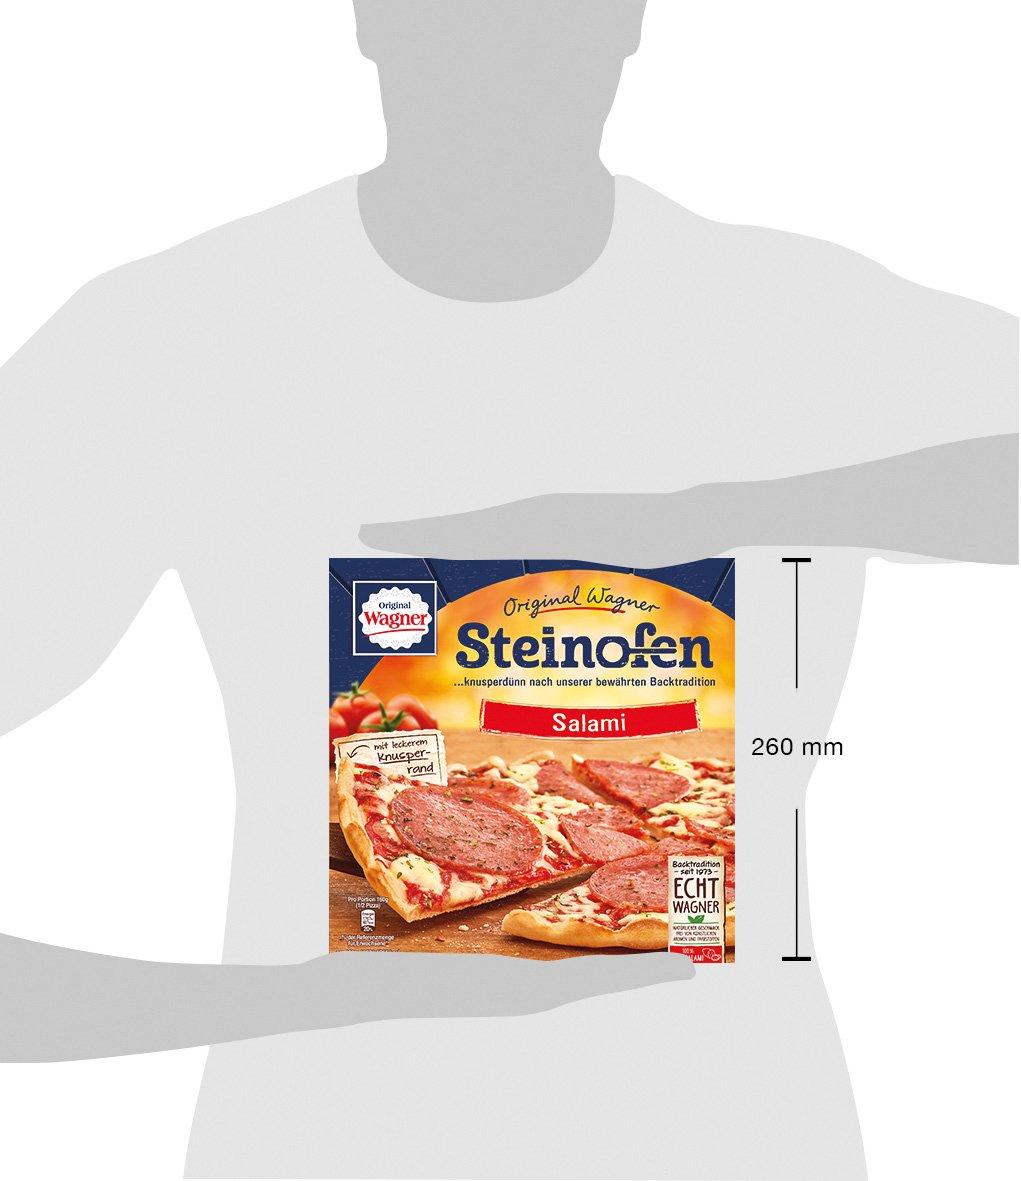 Wagner Steinofen Pizza Salami Kcal - ARCHIDEV